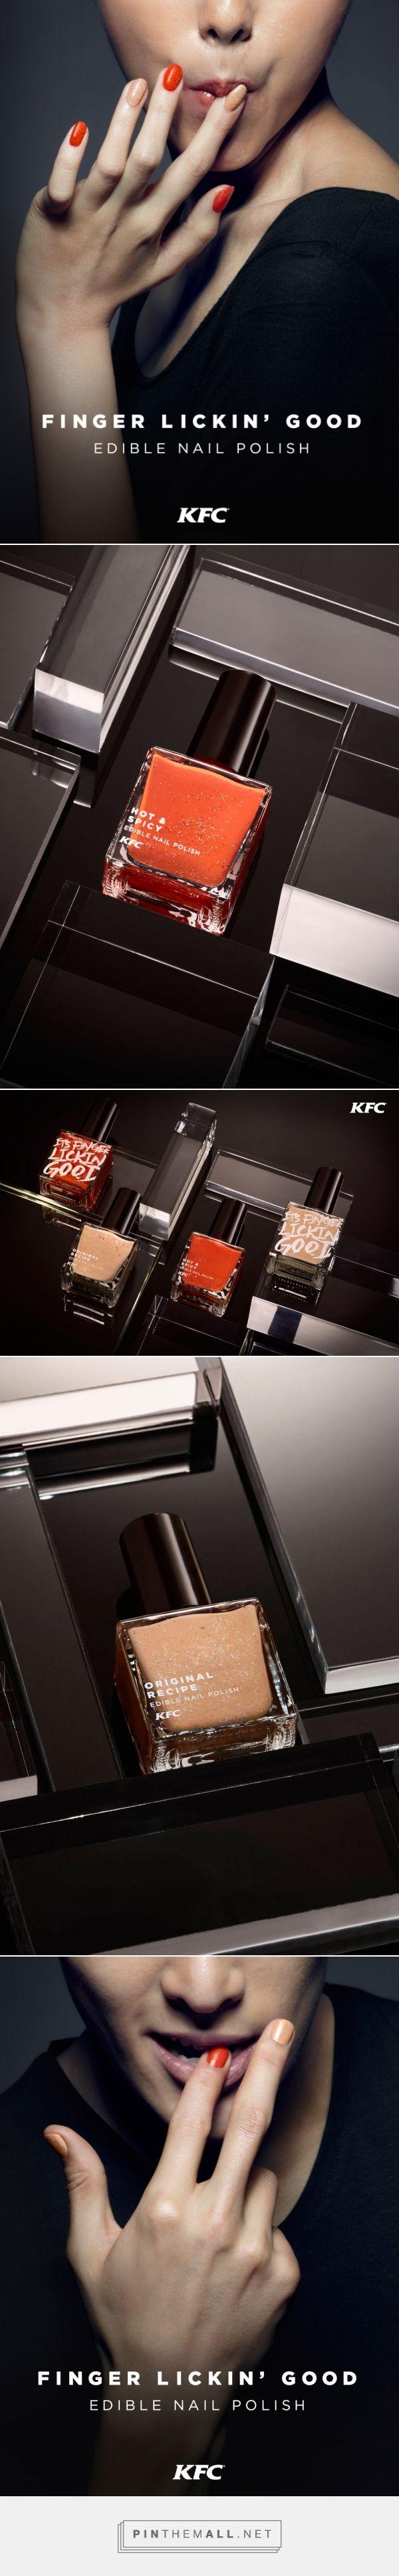 KFC introduces Finger Lickin Good edible nail polish - oukas.info